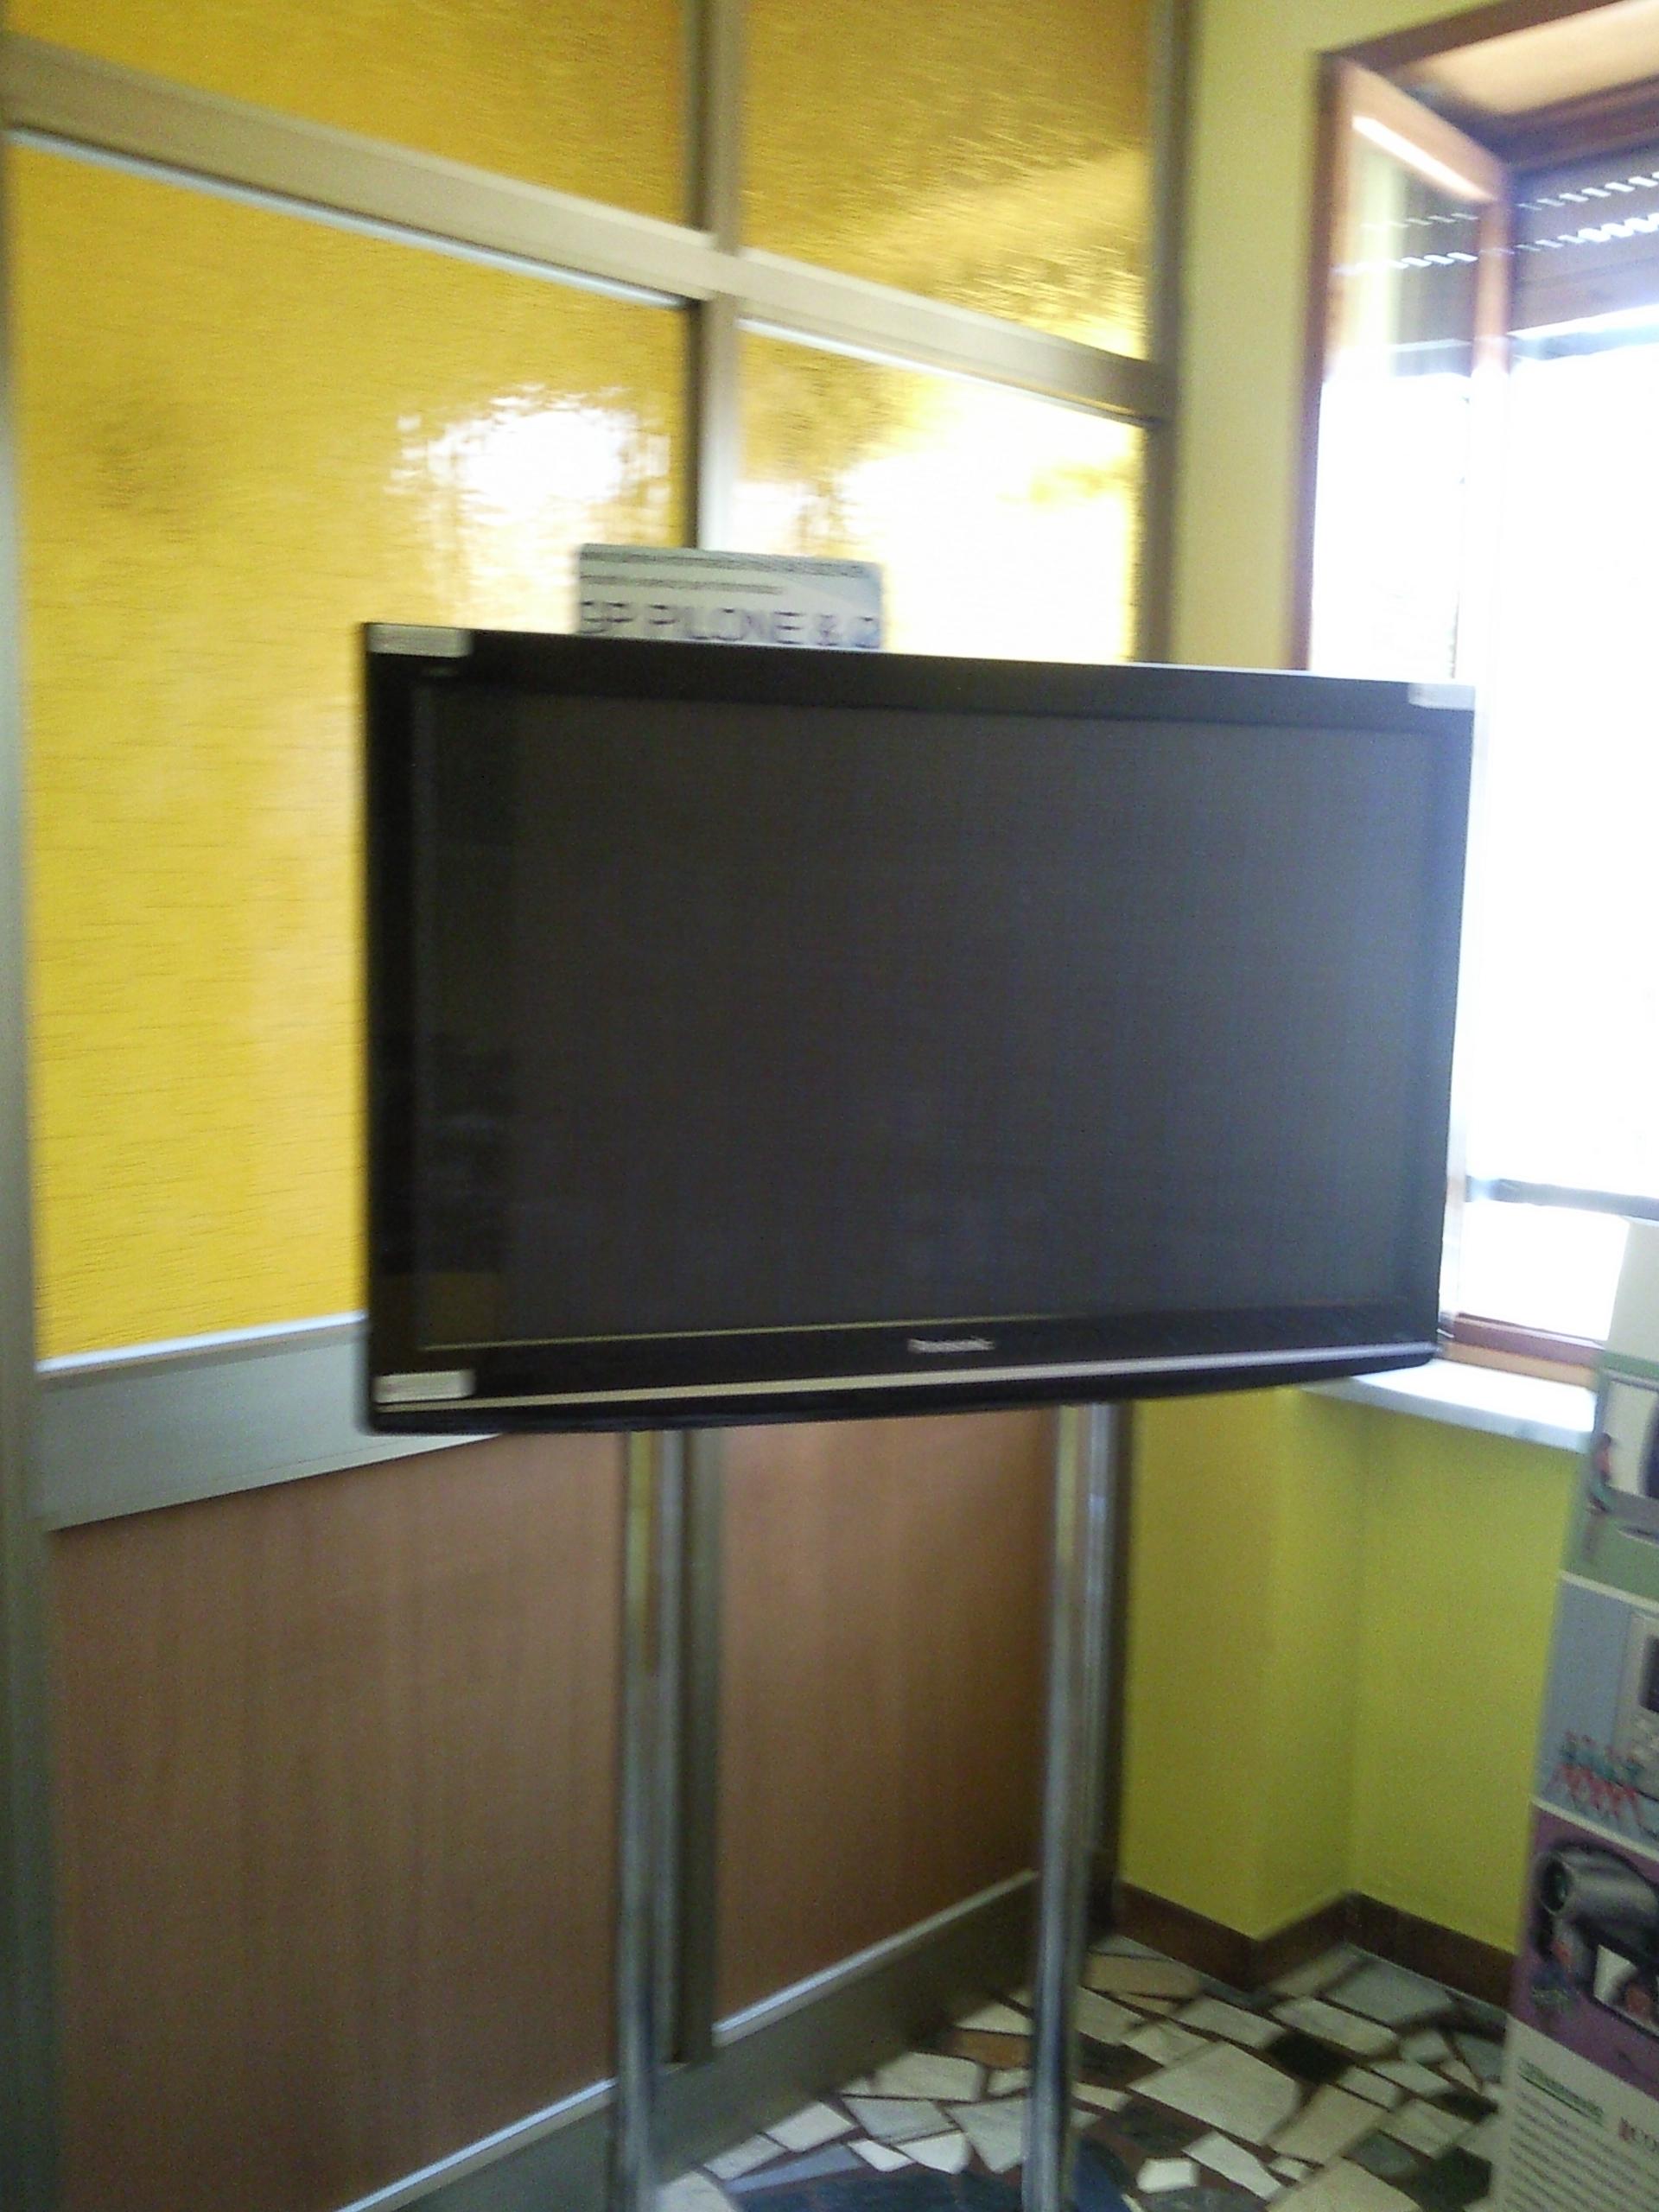 Gp pilone noleggio vendita tv plasma led panasonic torino asti ...